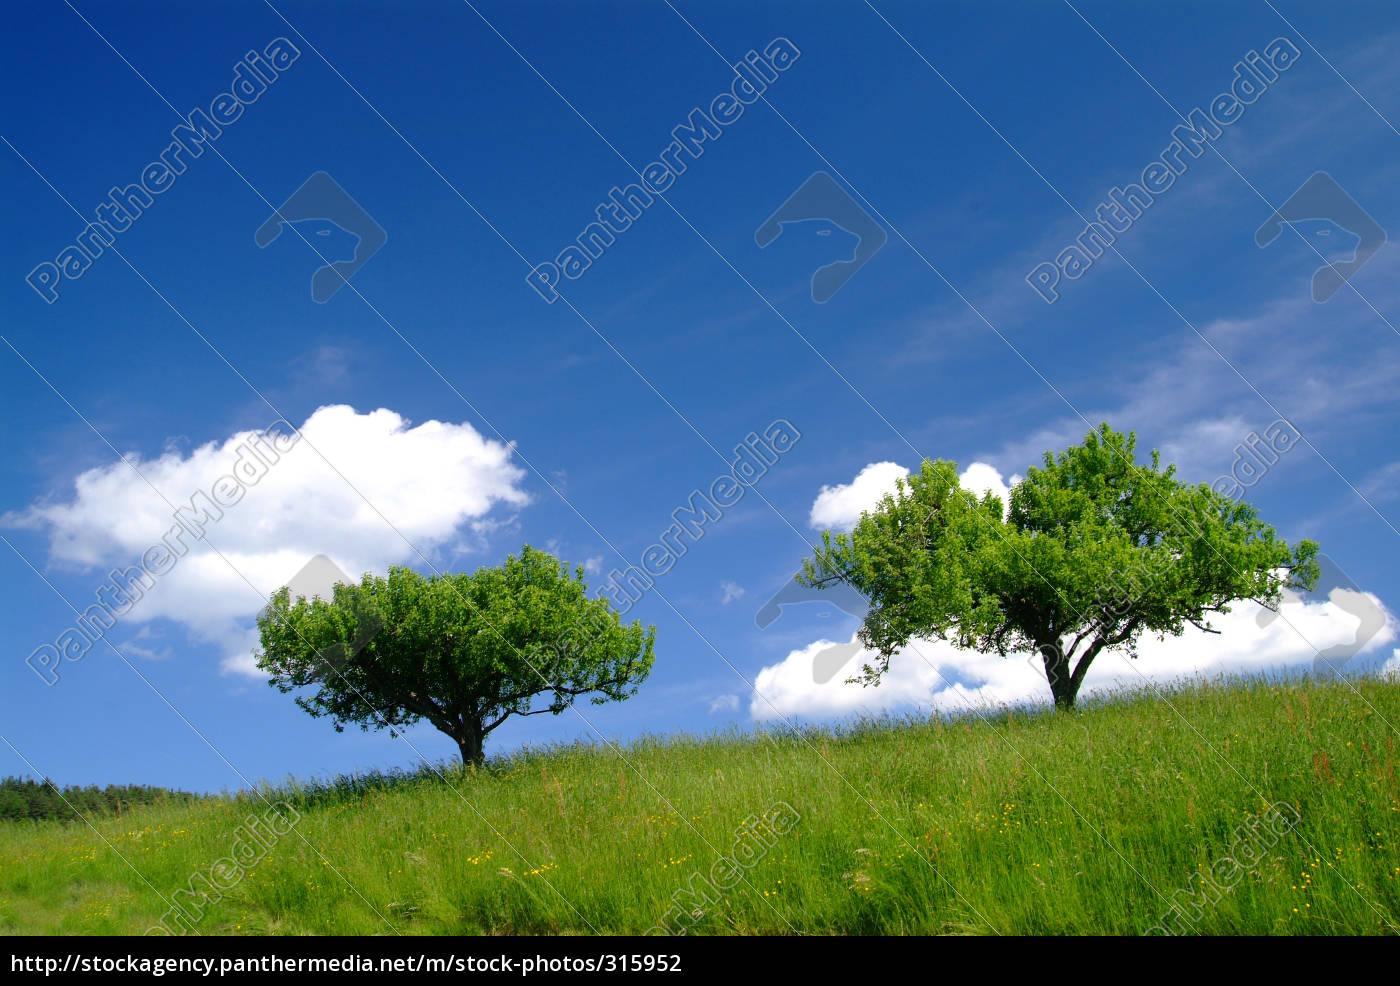 tree, with, sky, 3 - 315952